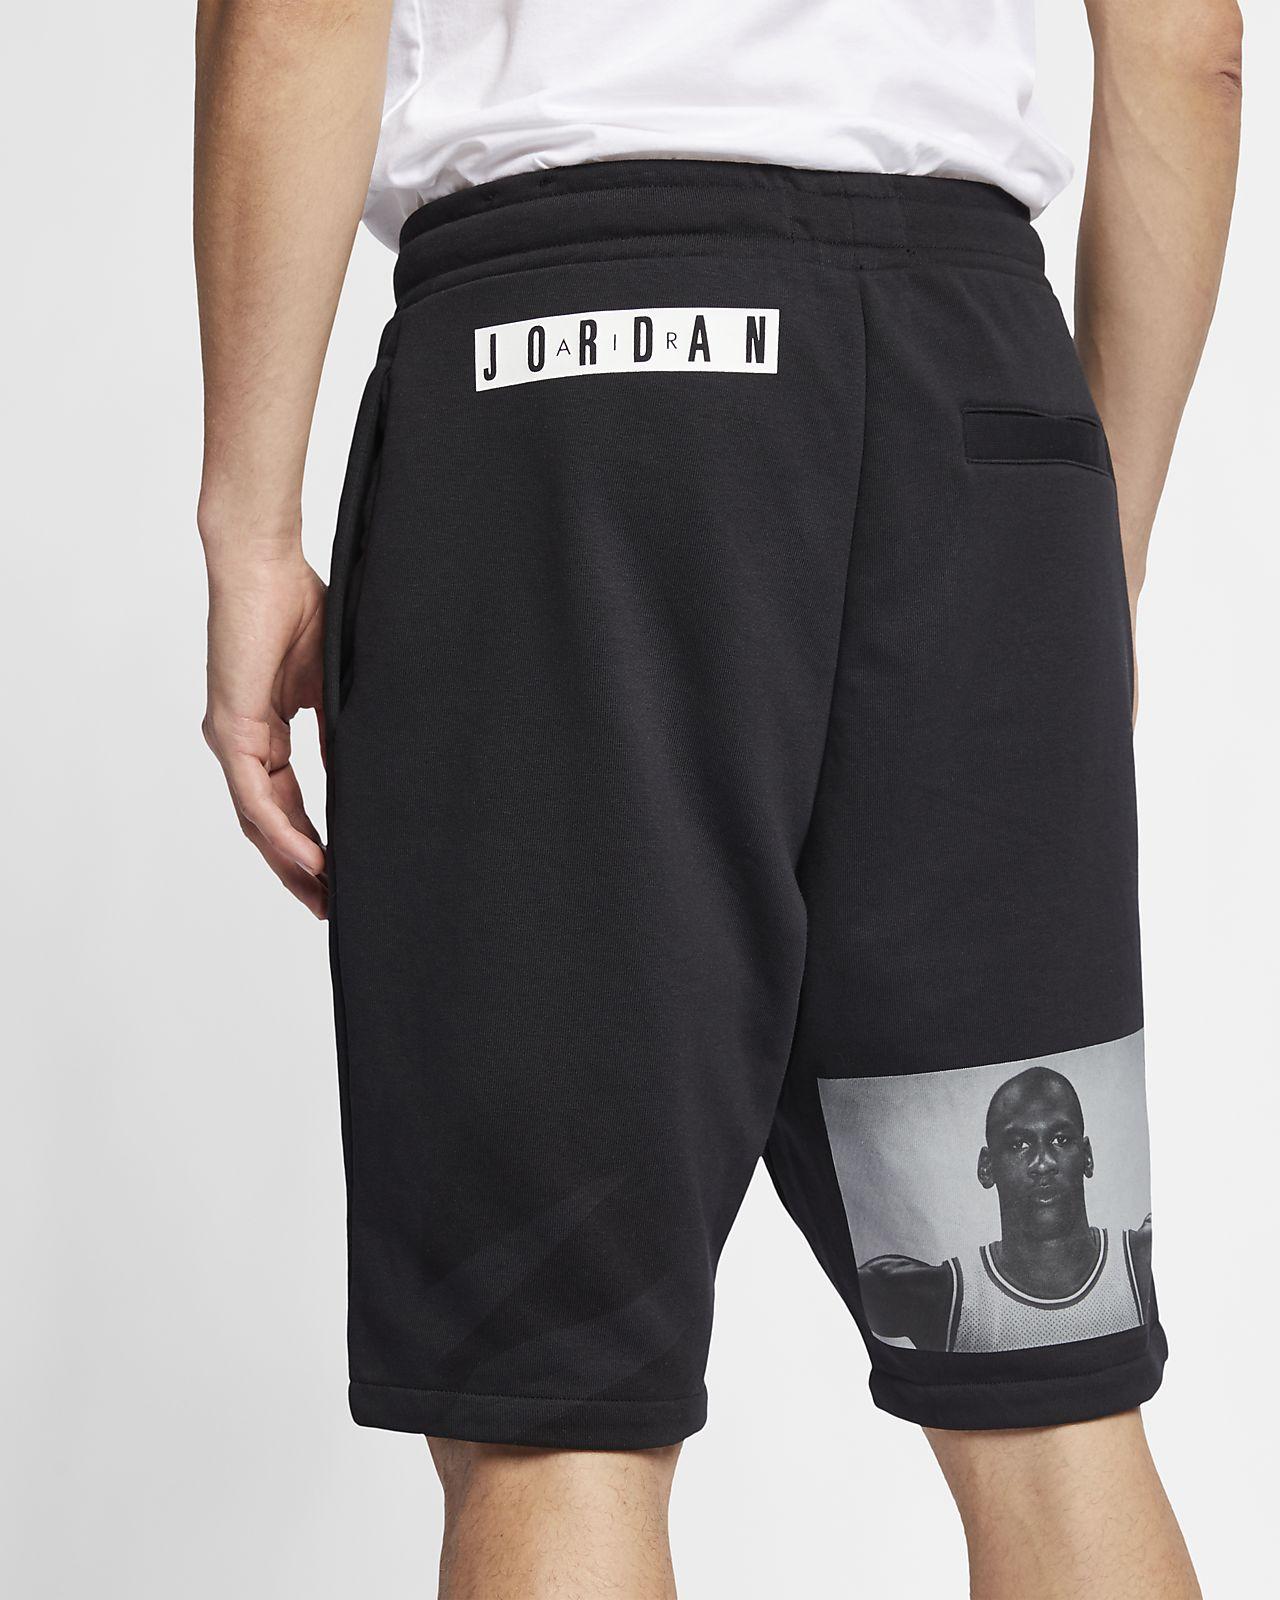 7805aadbacb Jordan Jumpman Men's Lightweight Fleece Shorts. Nike.com IN